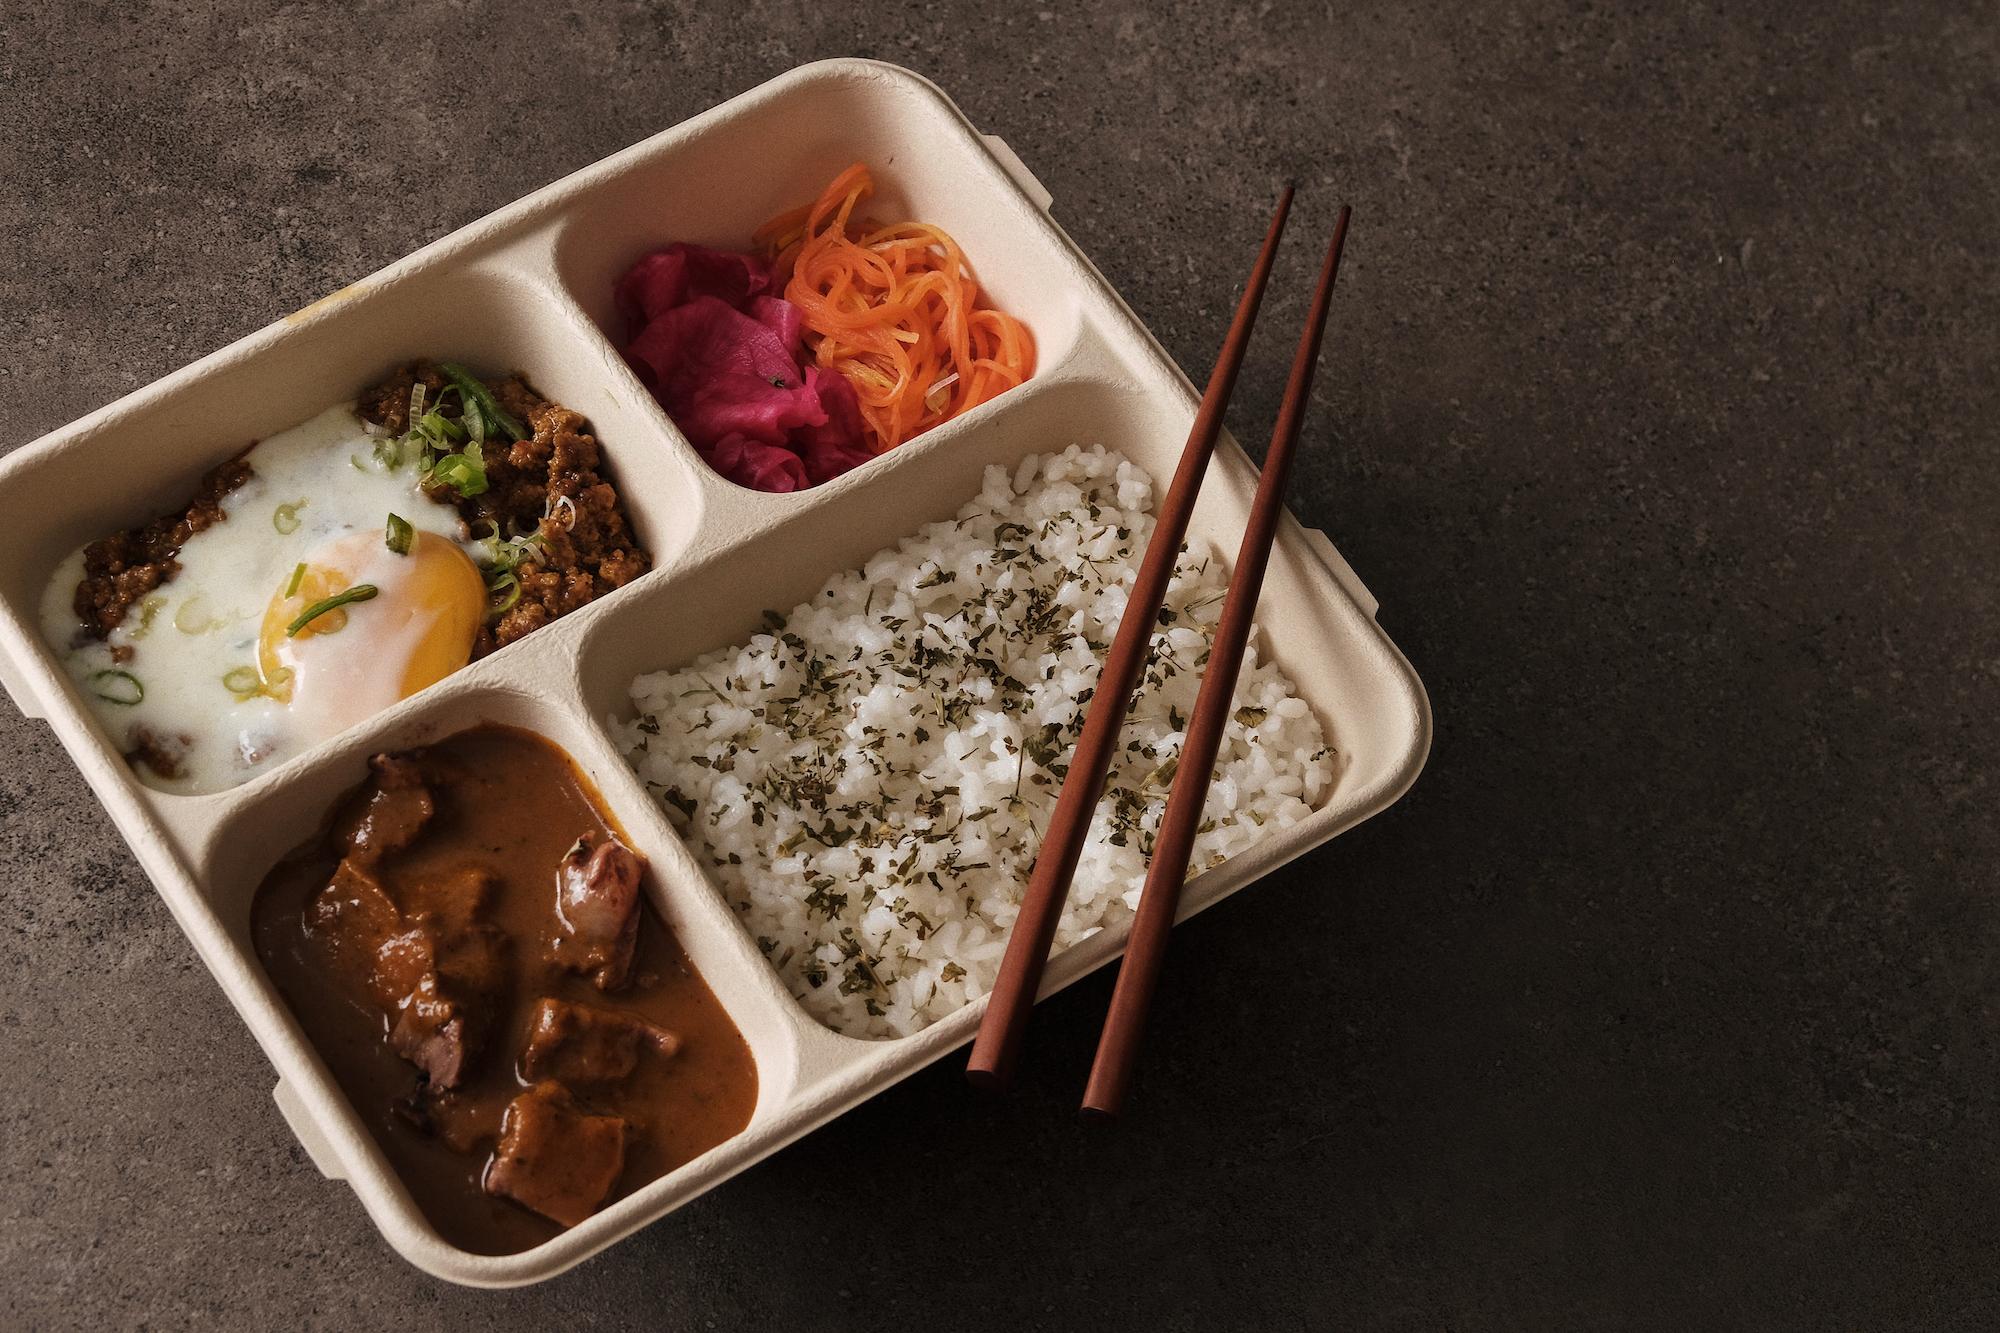 From the beginning, Kumakuma has always been intent on crafting a curry-centric menu